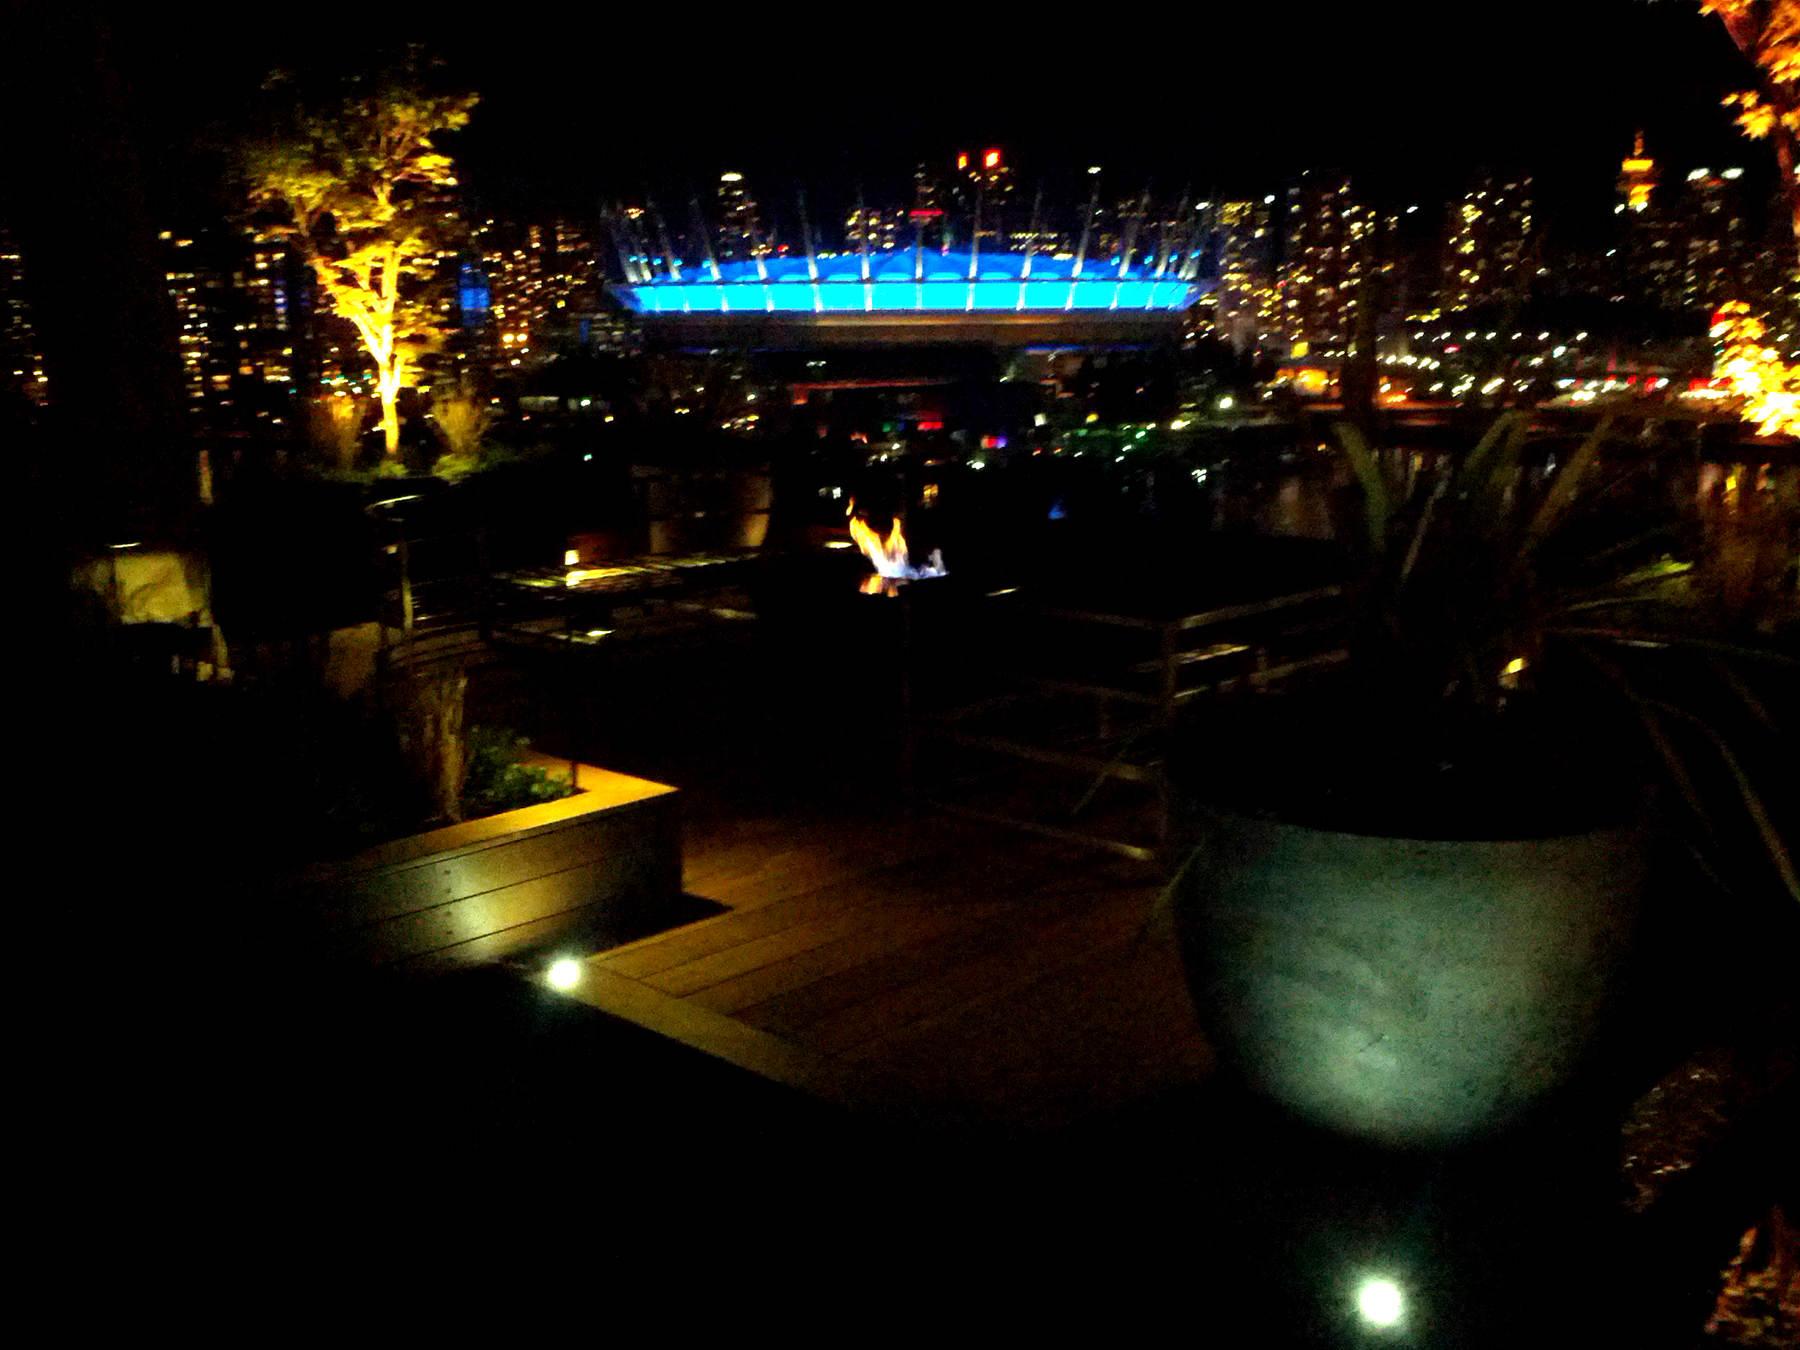 Olympic Village - Penthouse Image 10.JPG